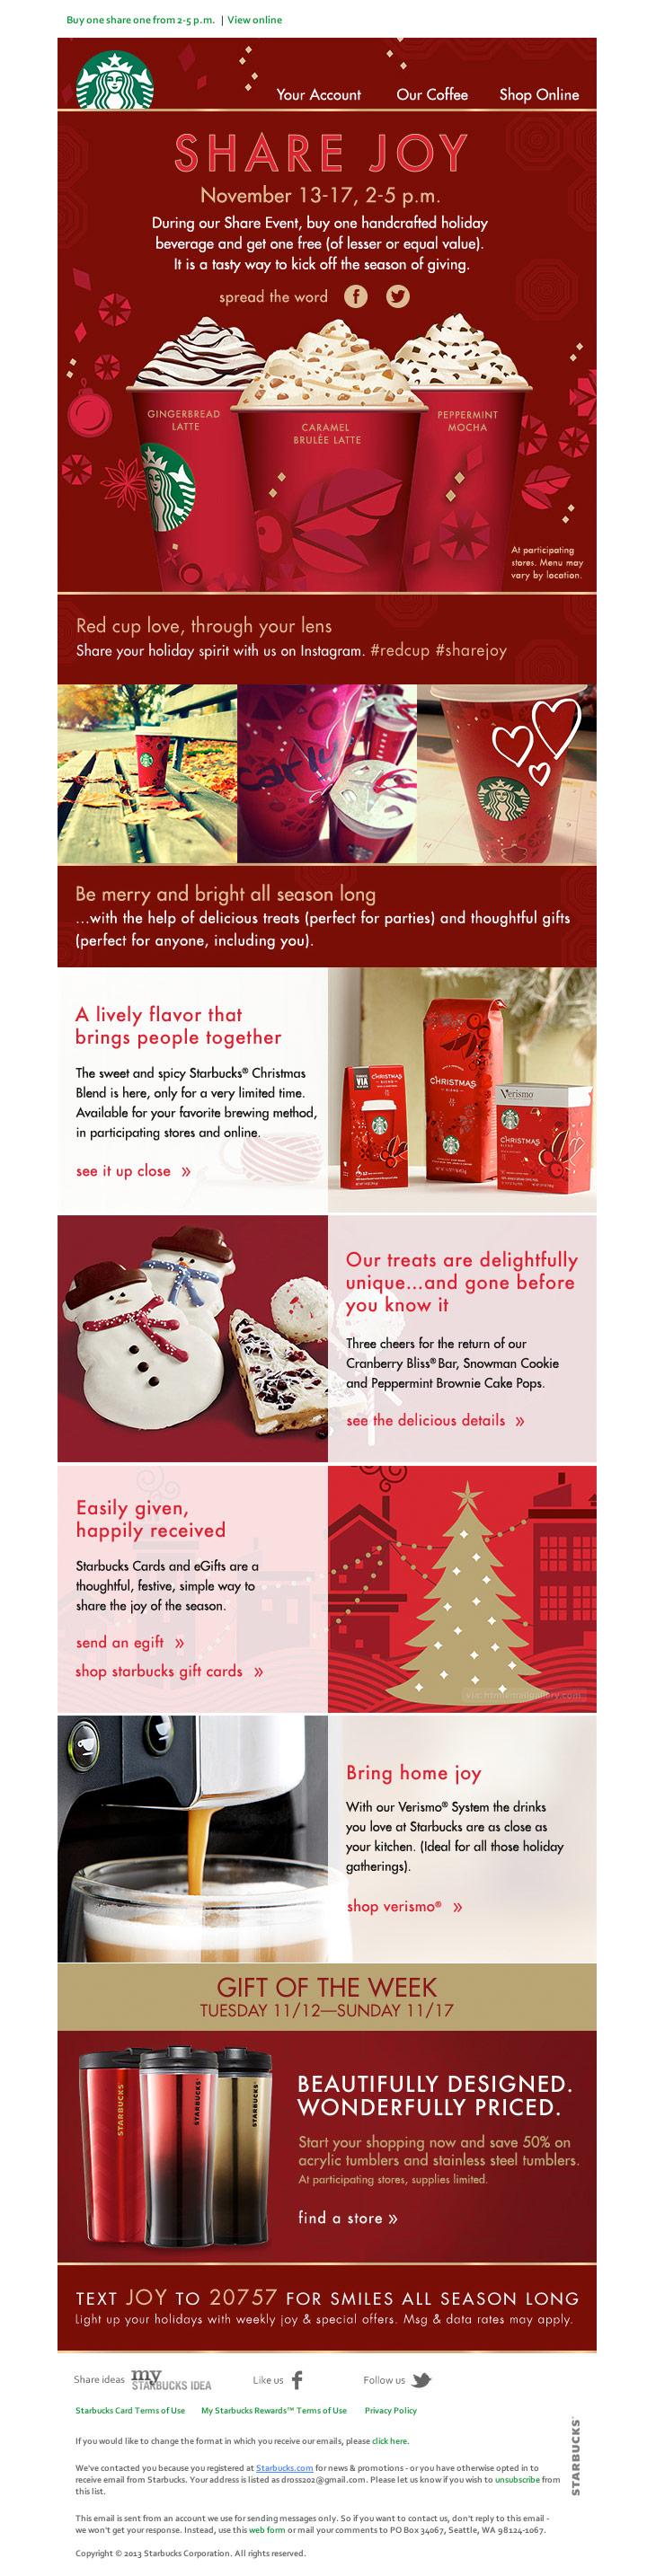 Starbucks Share Joy Holiday email